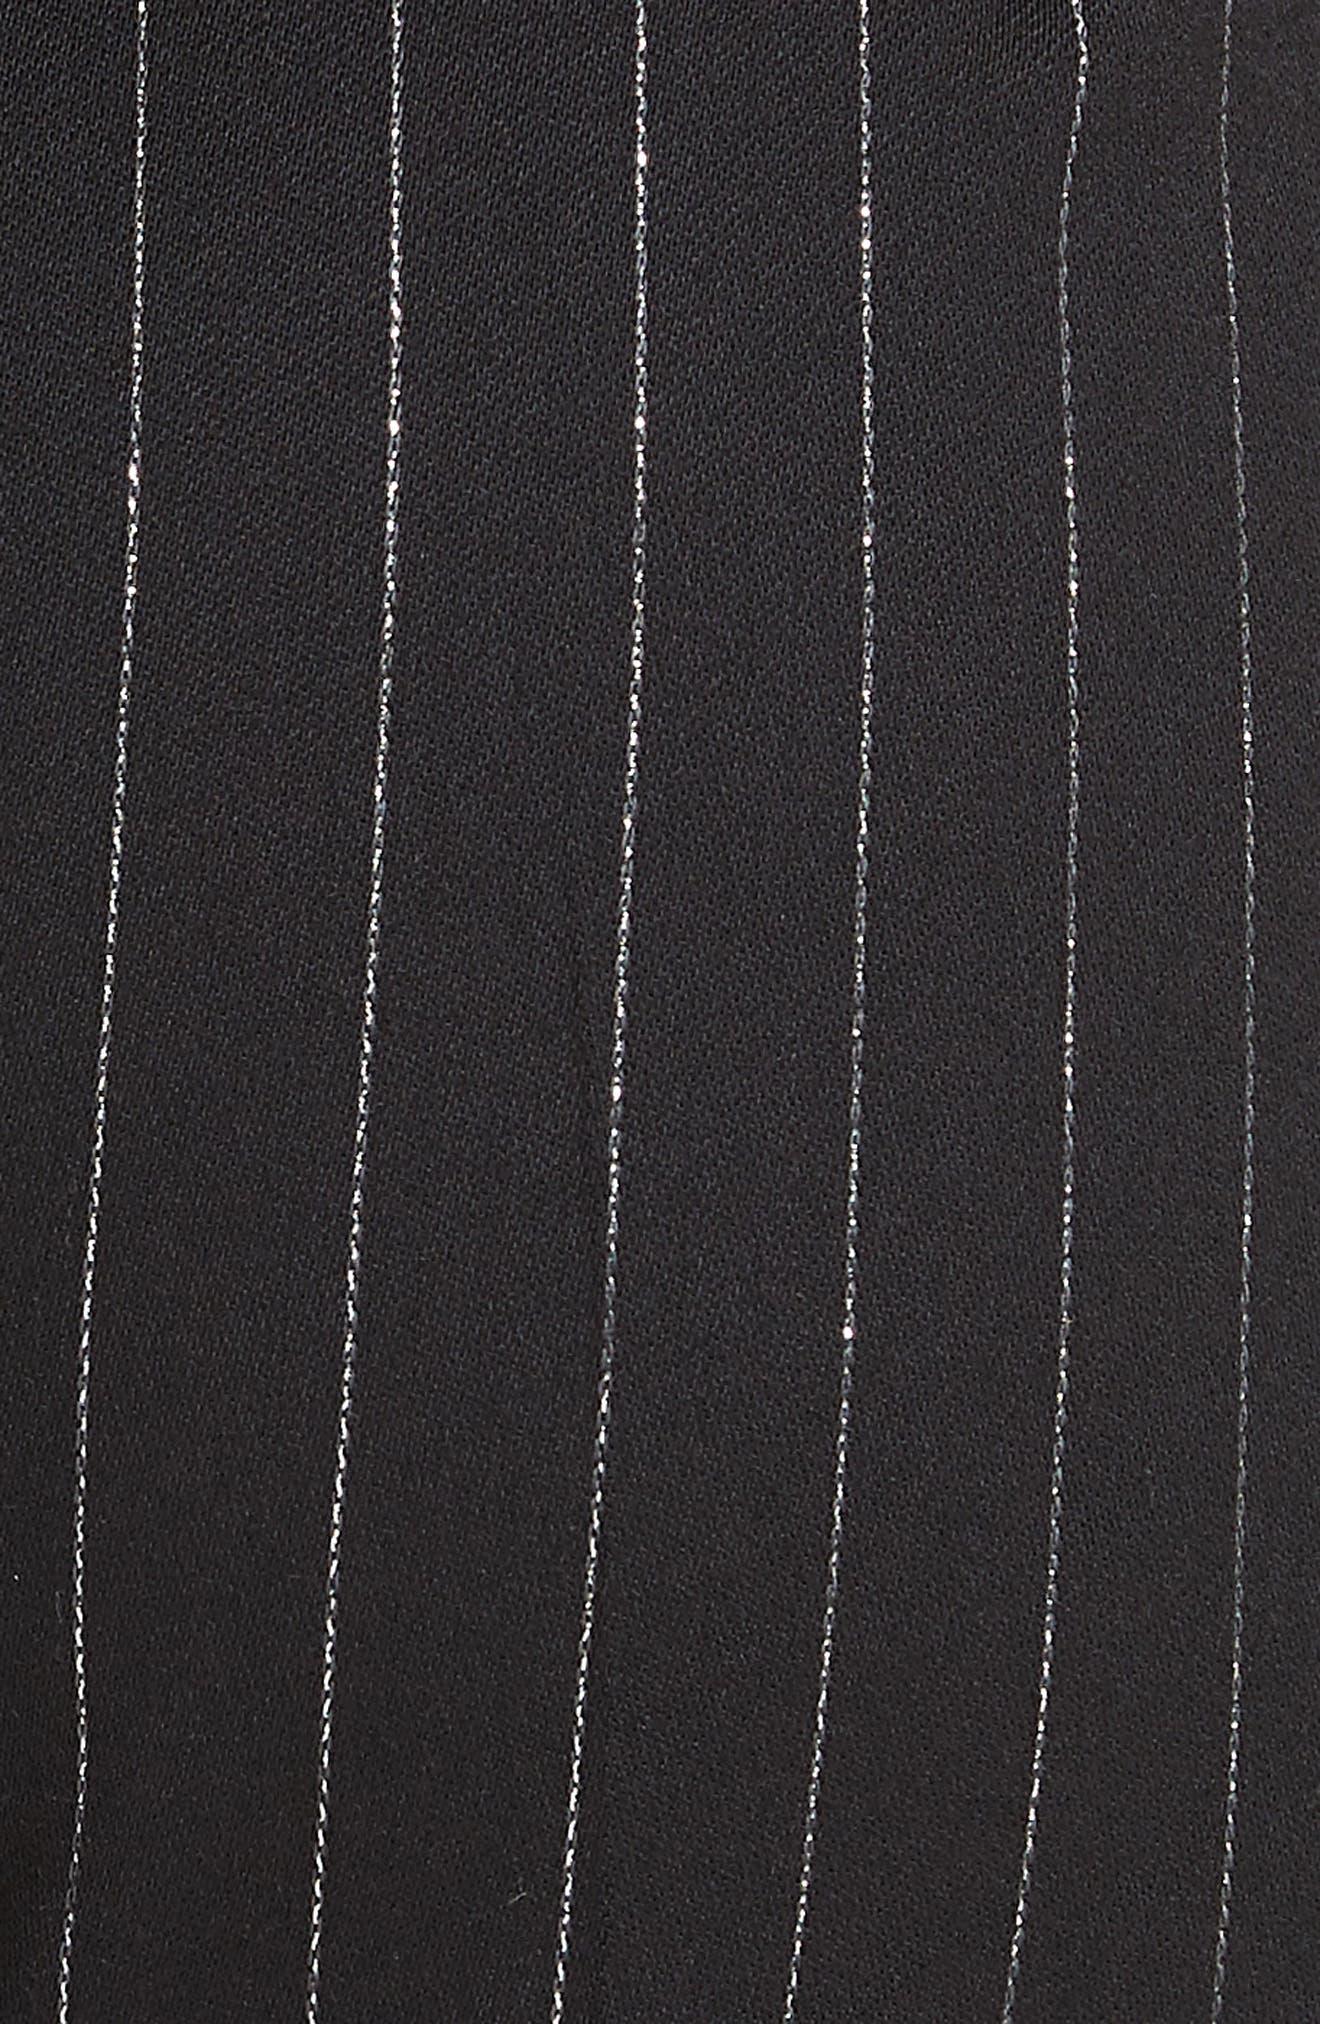 Metallic Pinstripe High Waist Skinny Wool Pants,                             Alternate thumbnail 6, color,                             BLACK